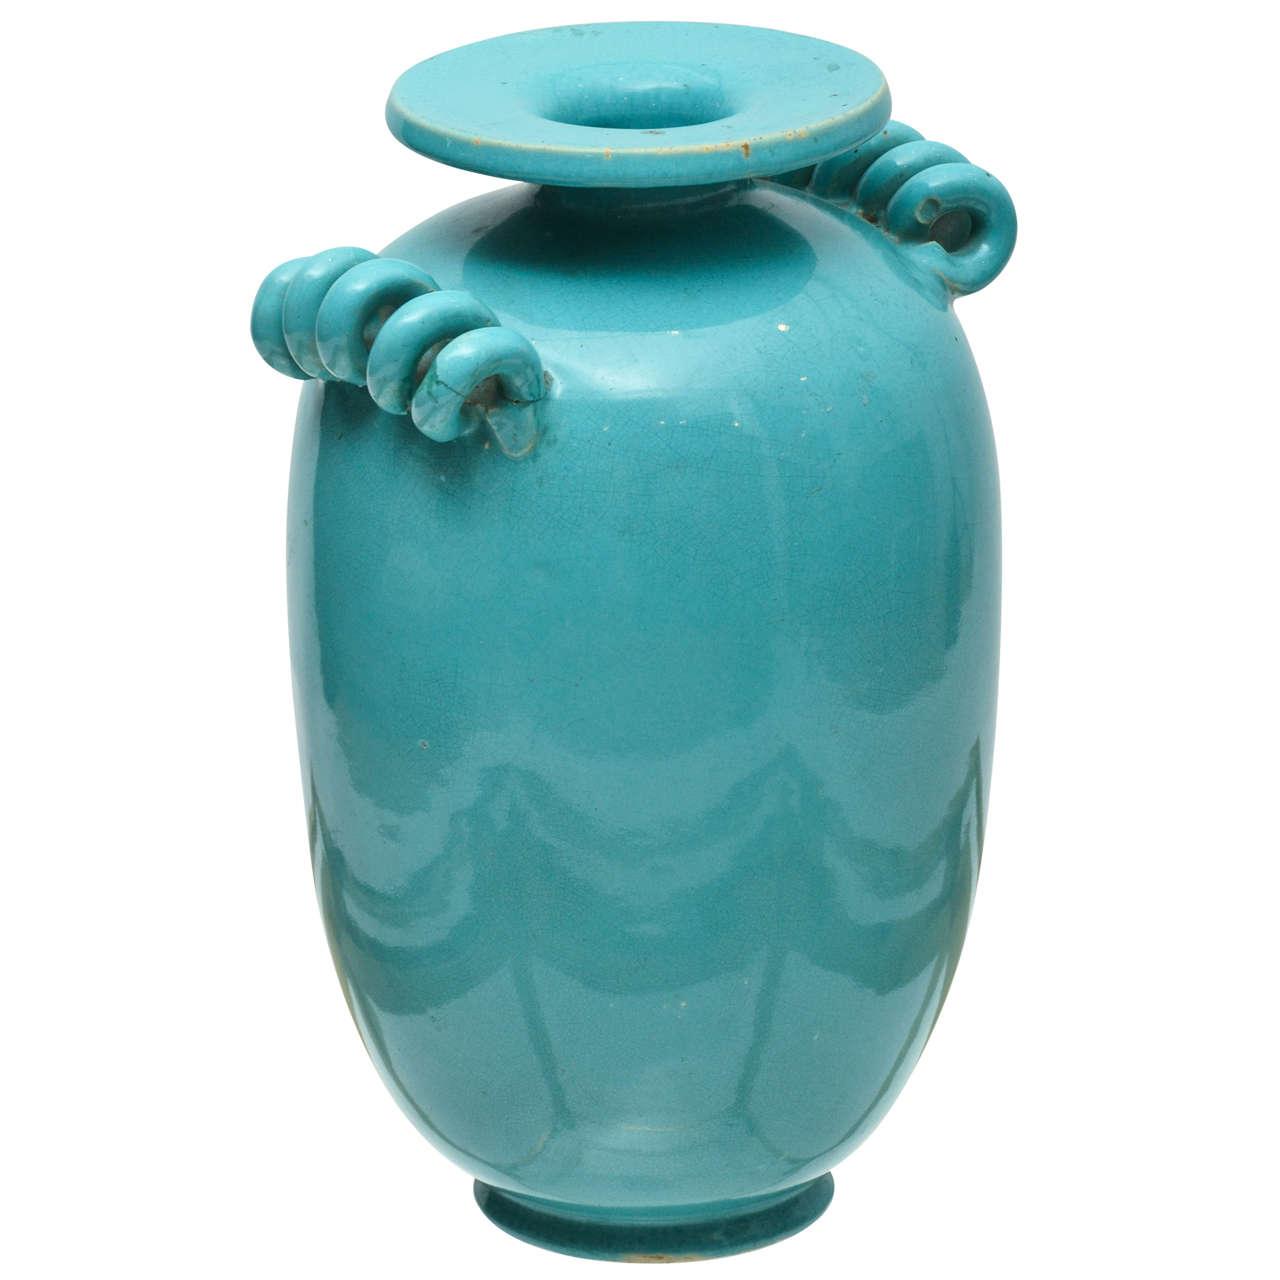 Mid century modern dutch art deco pottery vase by geuren for sale mid century modern dutch art deco pottery vase by geuren for sale reviewsmspy